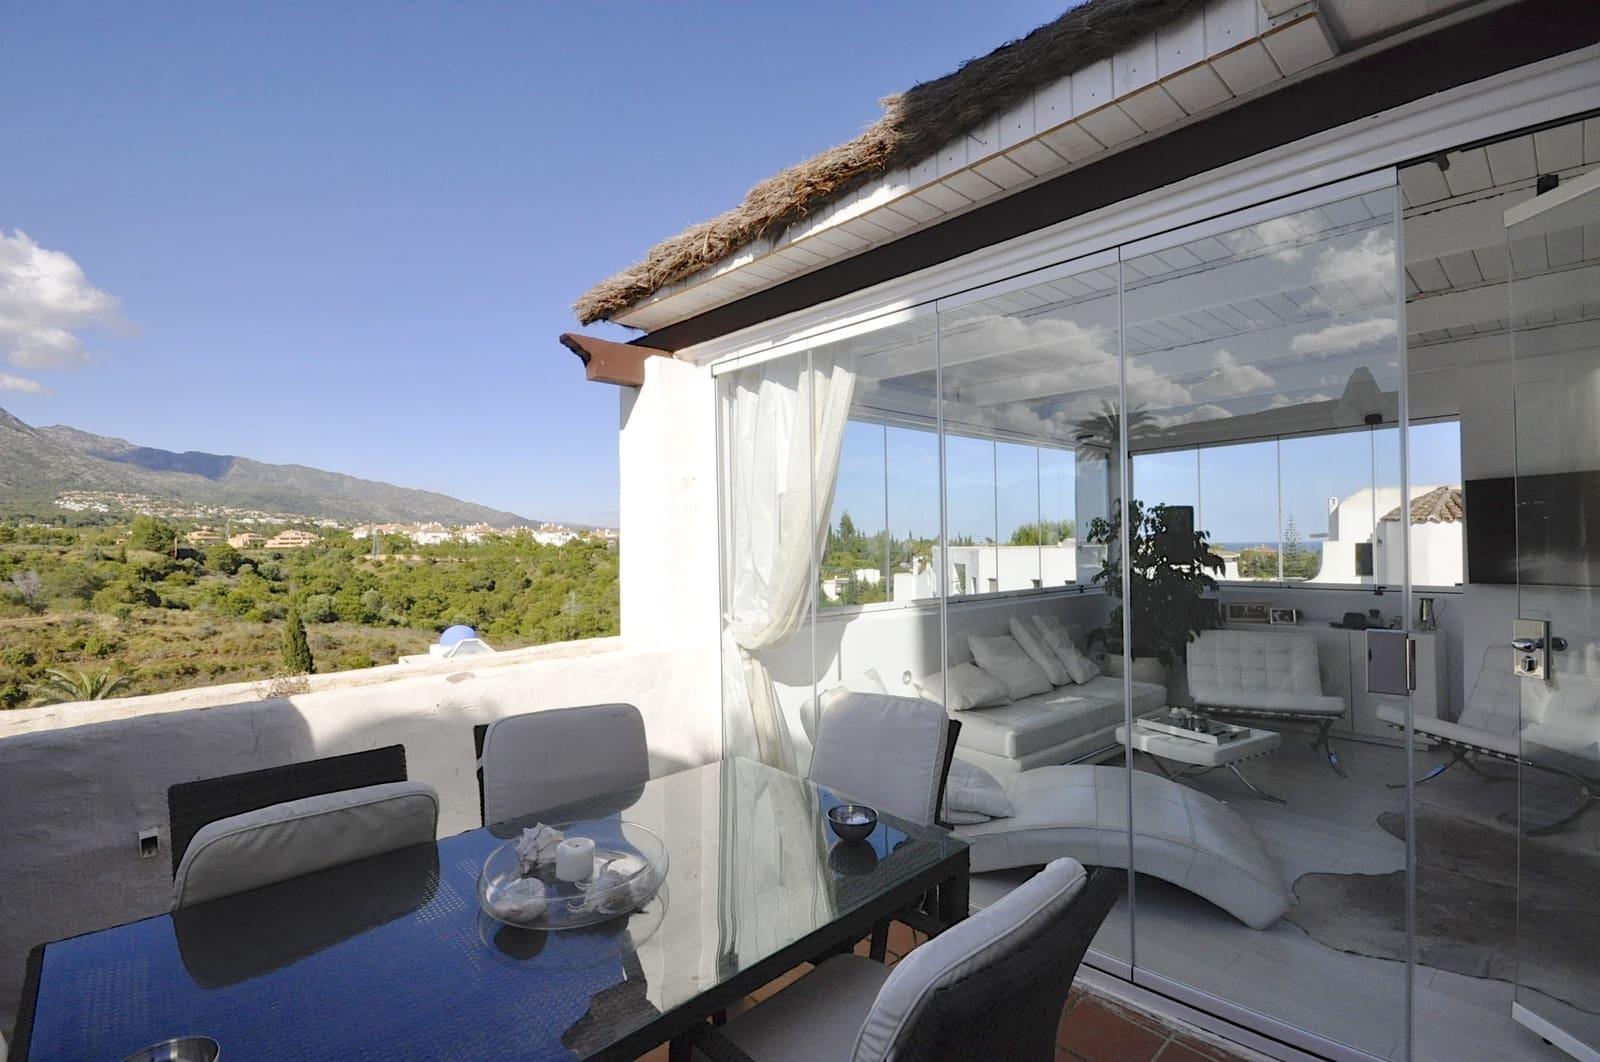 3 bedroom Flat for sale in Marbella - € 450,000 (Ref: 5147755)